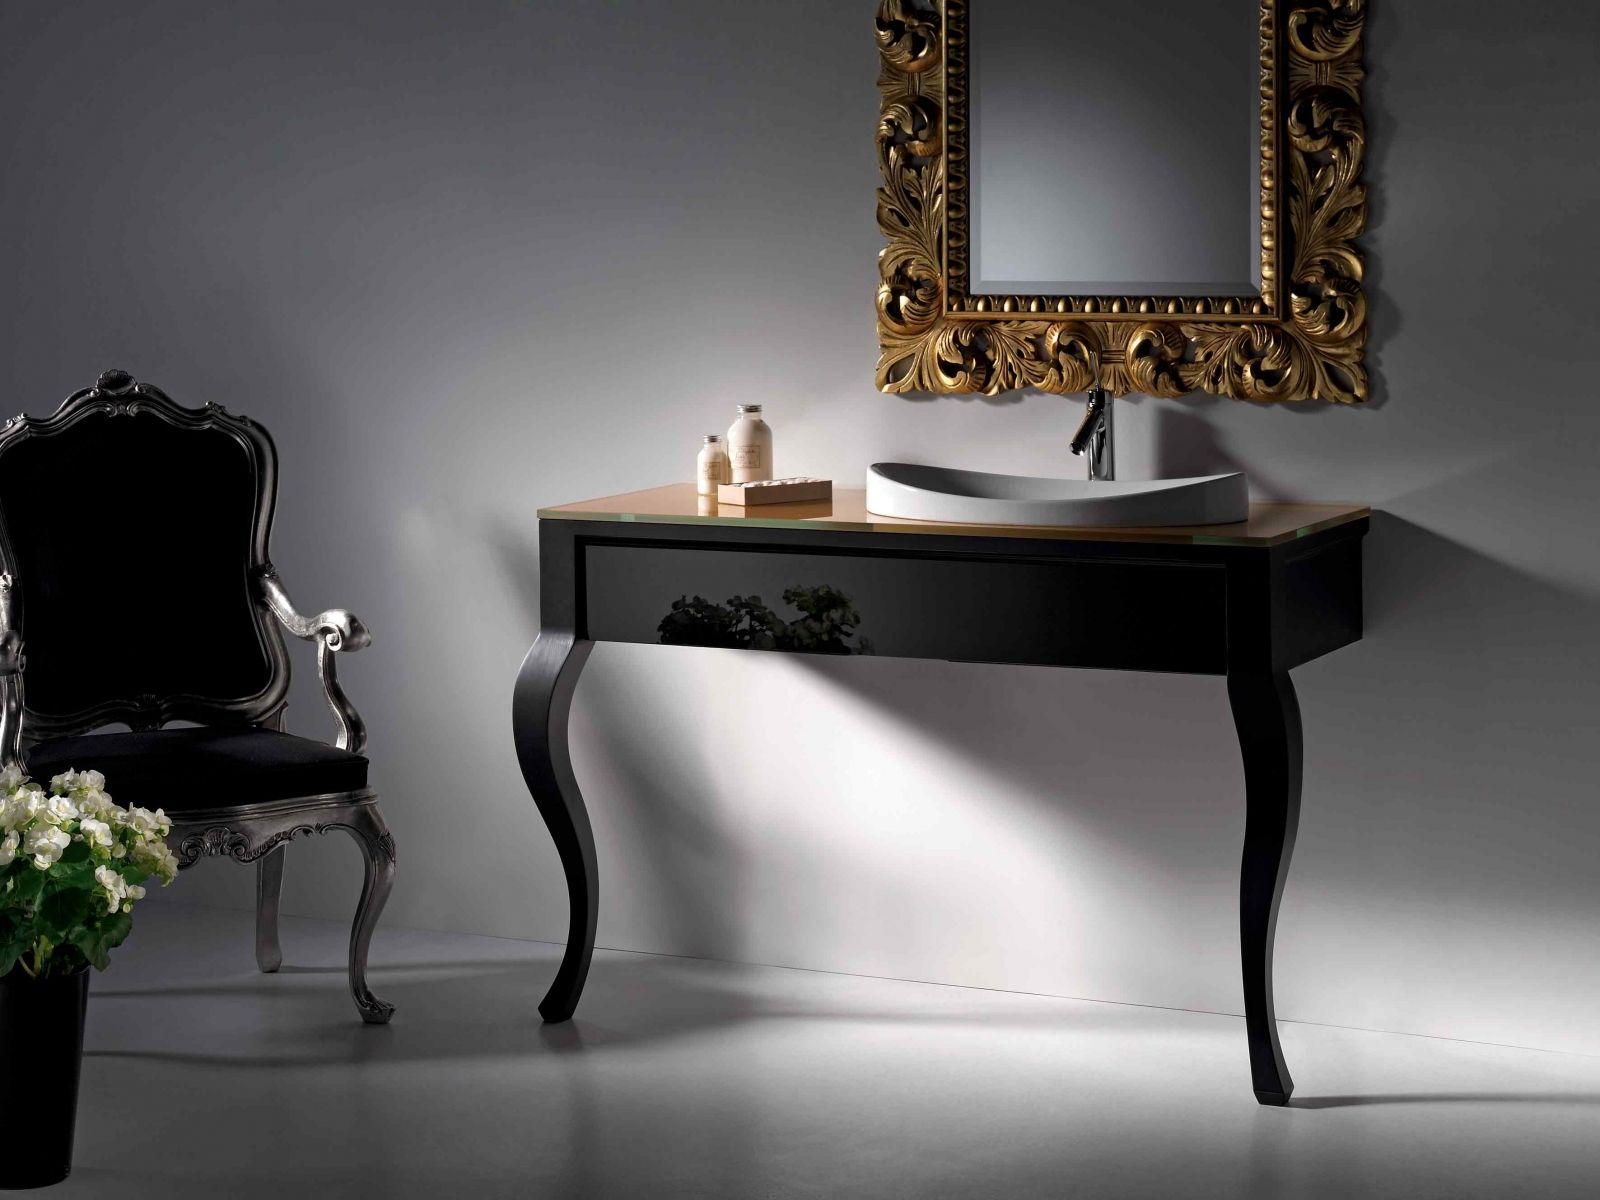 Artelinea | Sapphire Spaces   Black Vanity By Artelinea. Italian Design,  Glamorous Bathroom Design